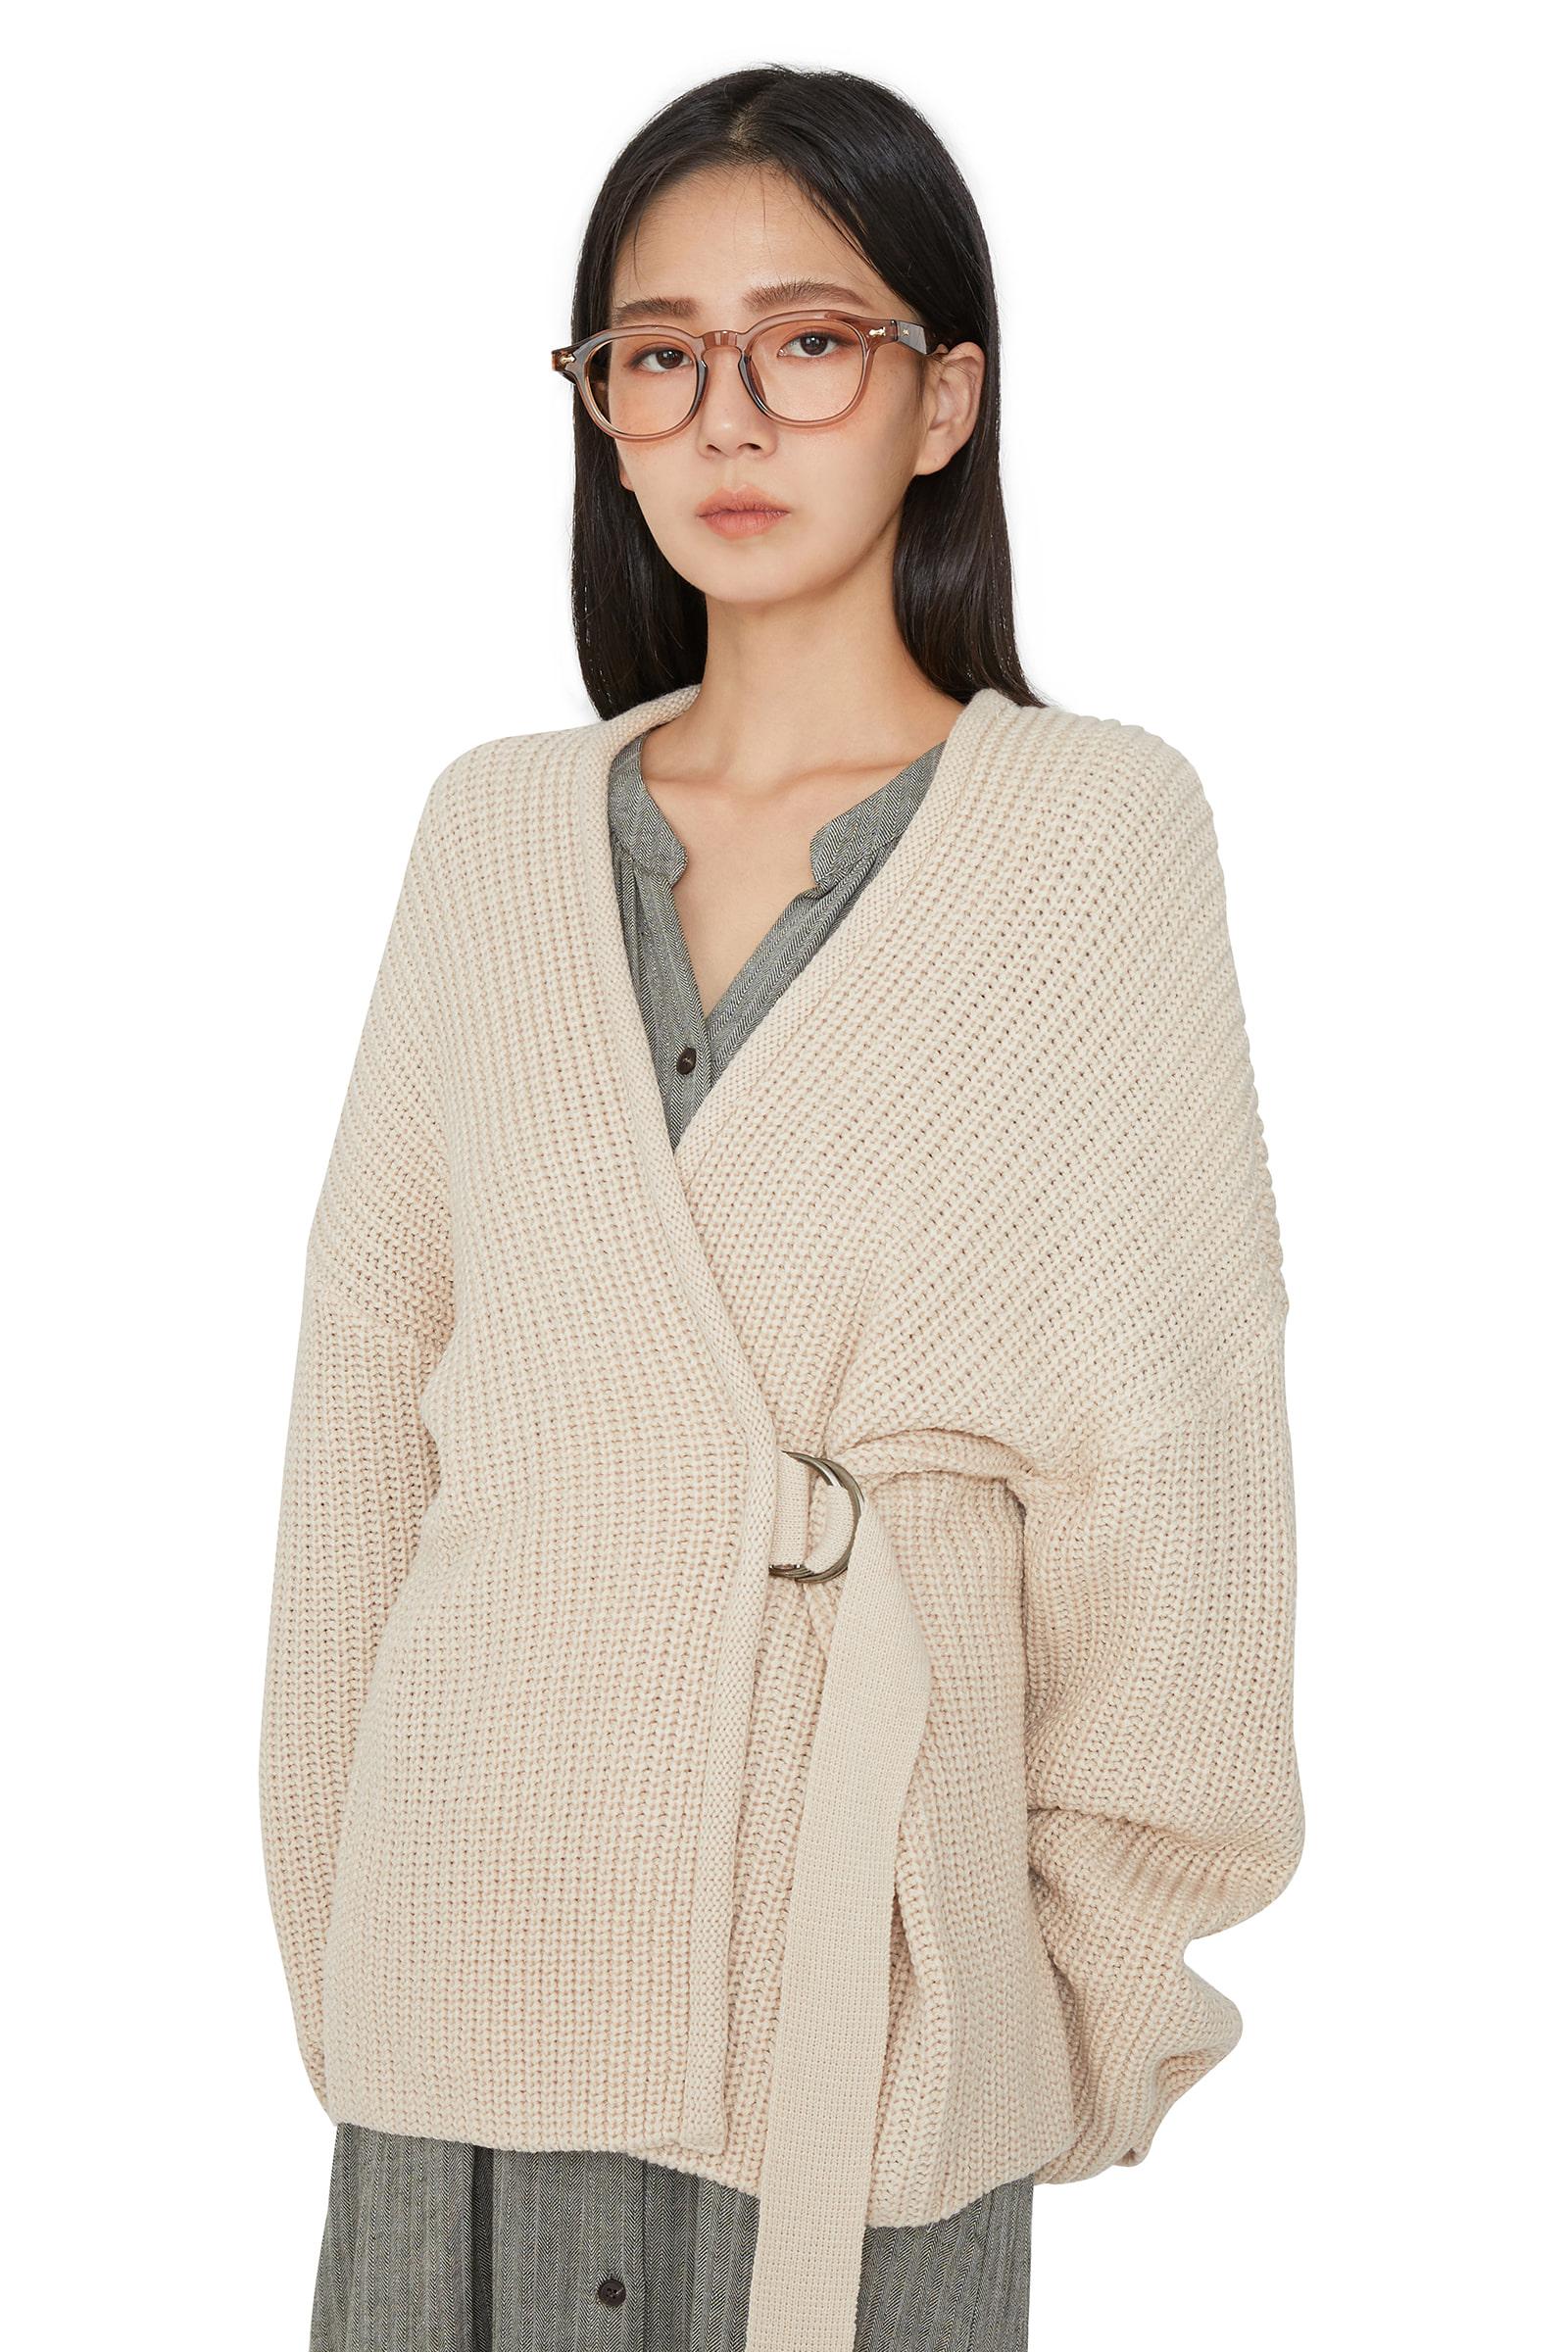 Heidi buckle-over knit cardigan